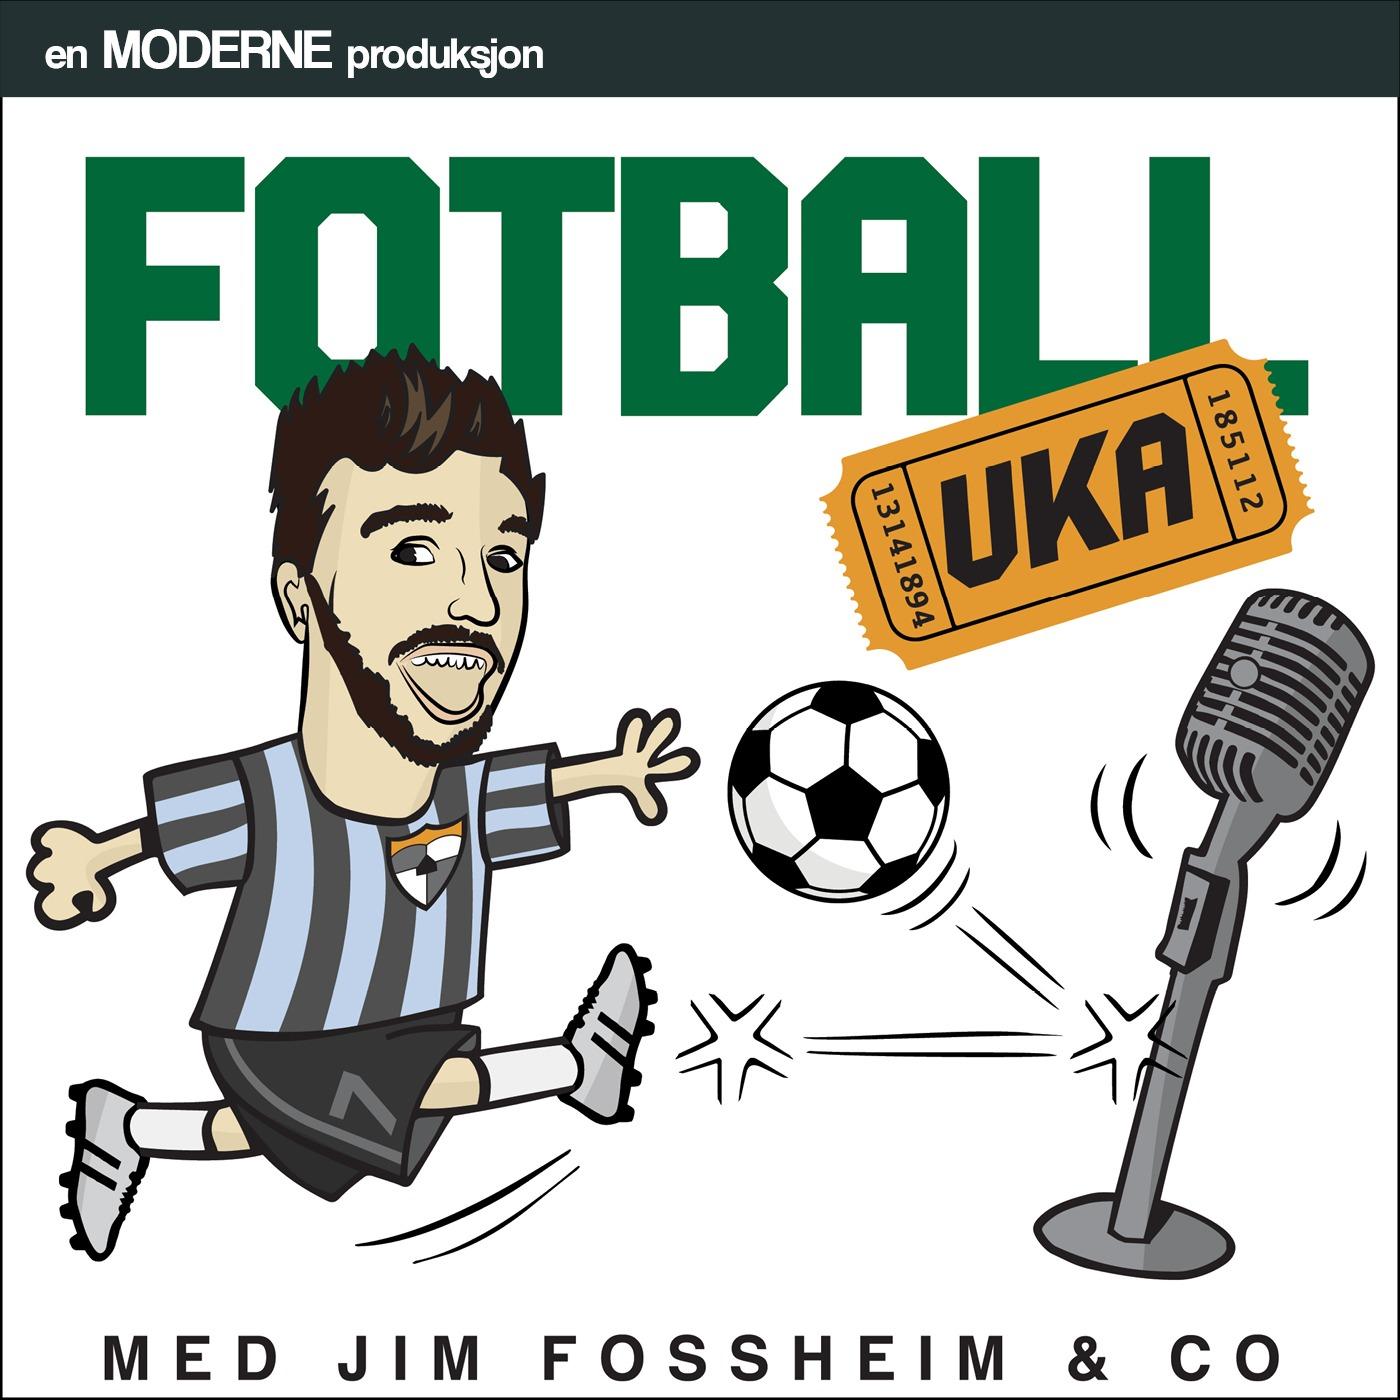 Fotballuka